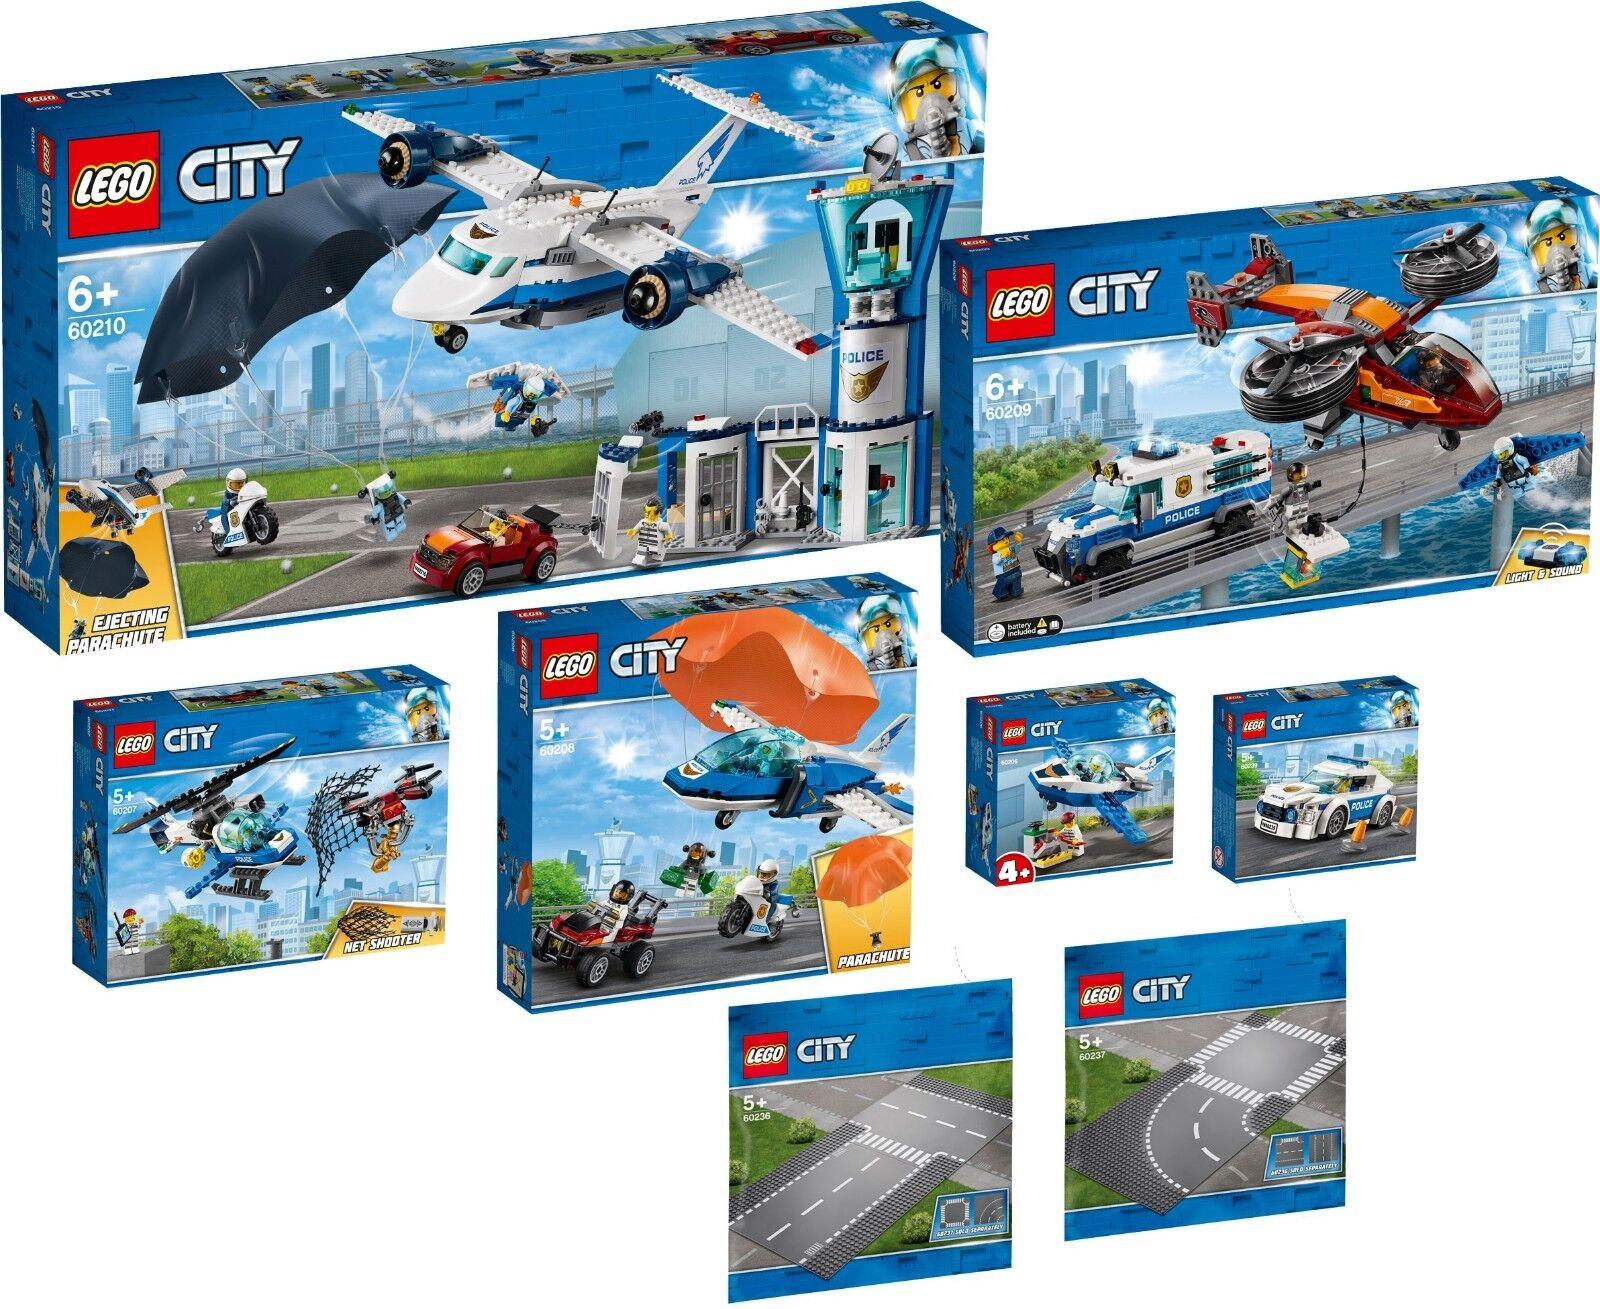 LEGO CITY POLIZIA 60210 60209 60208 60207 60206 60239 60236 60237 n1 prevendita